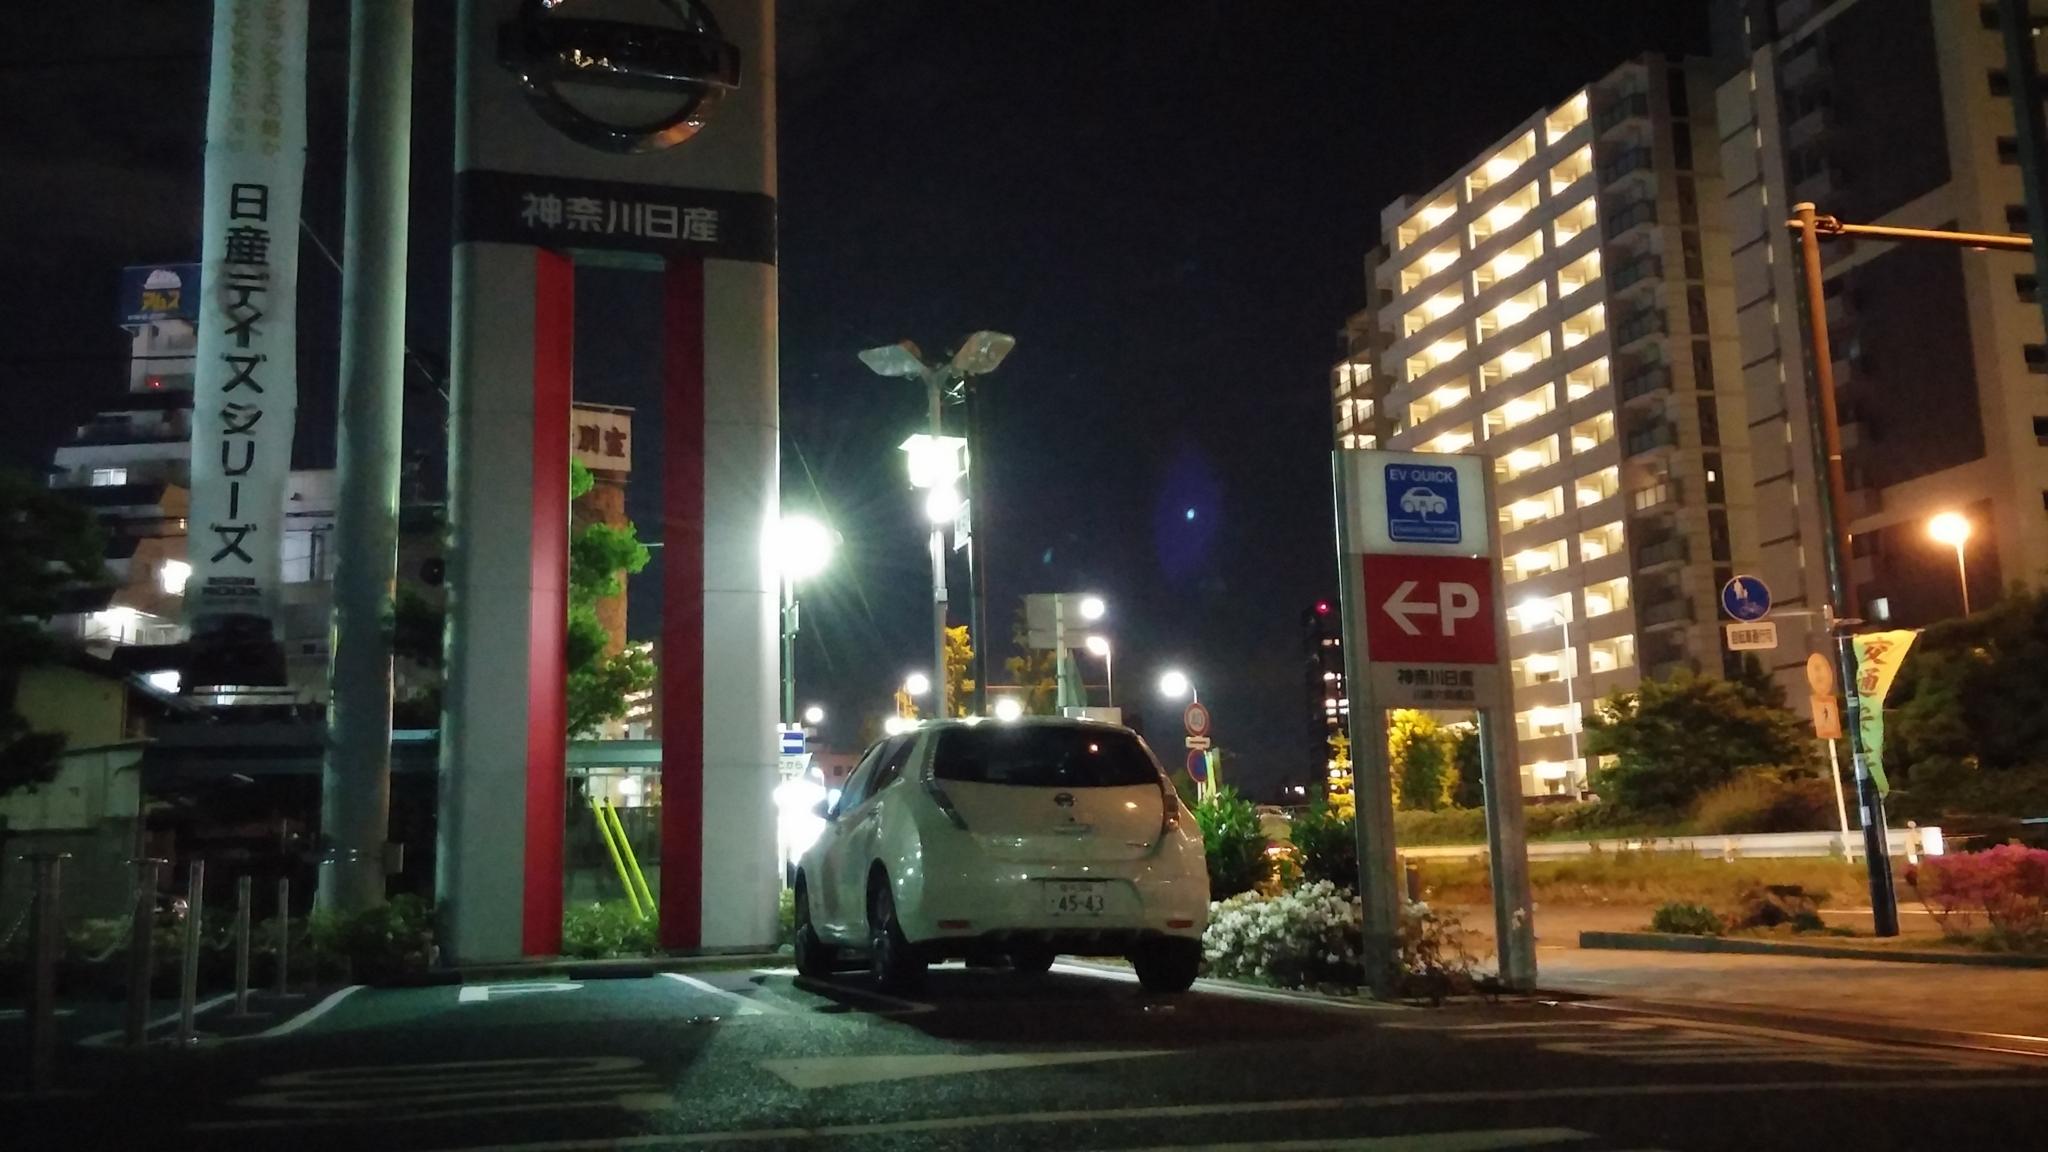 f:id:ToshUeno:20150510230535j:plain